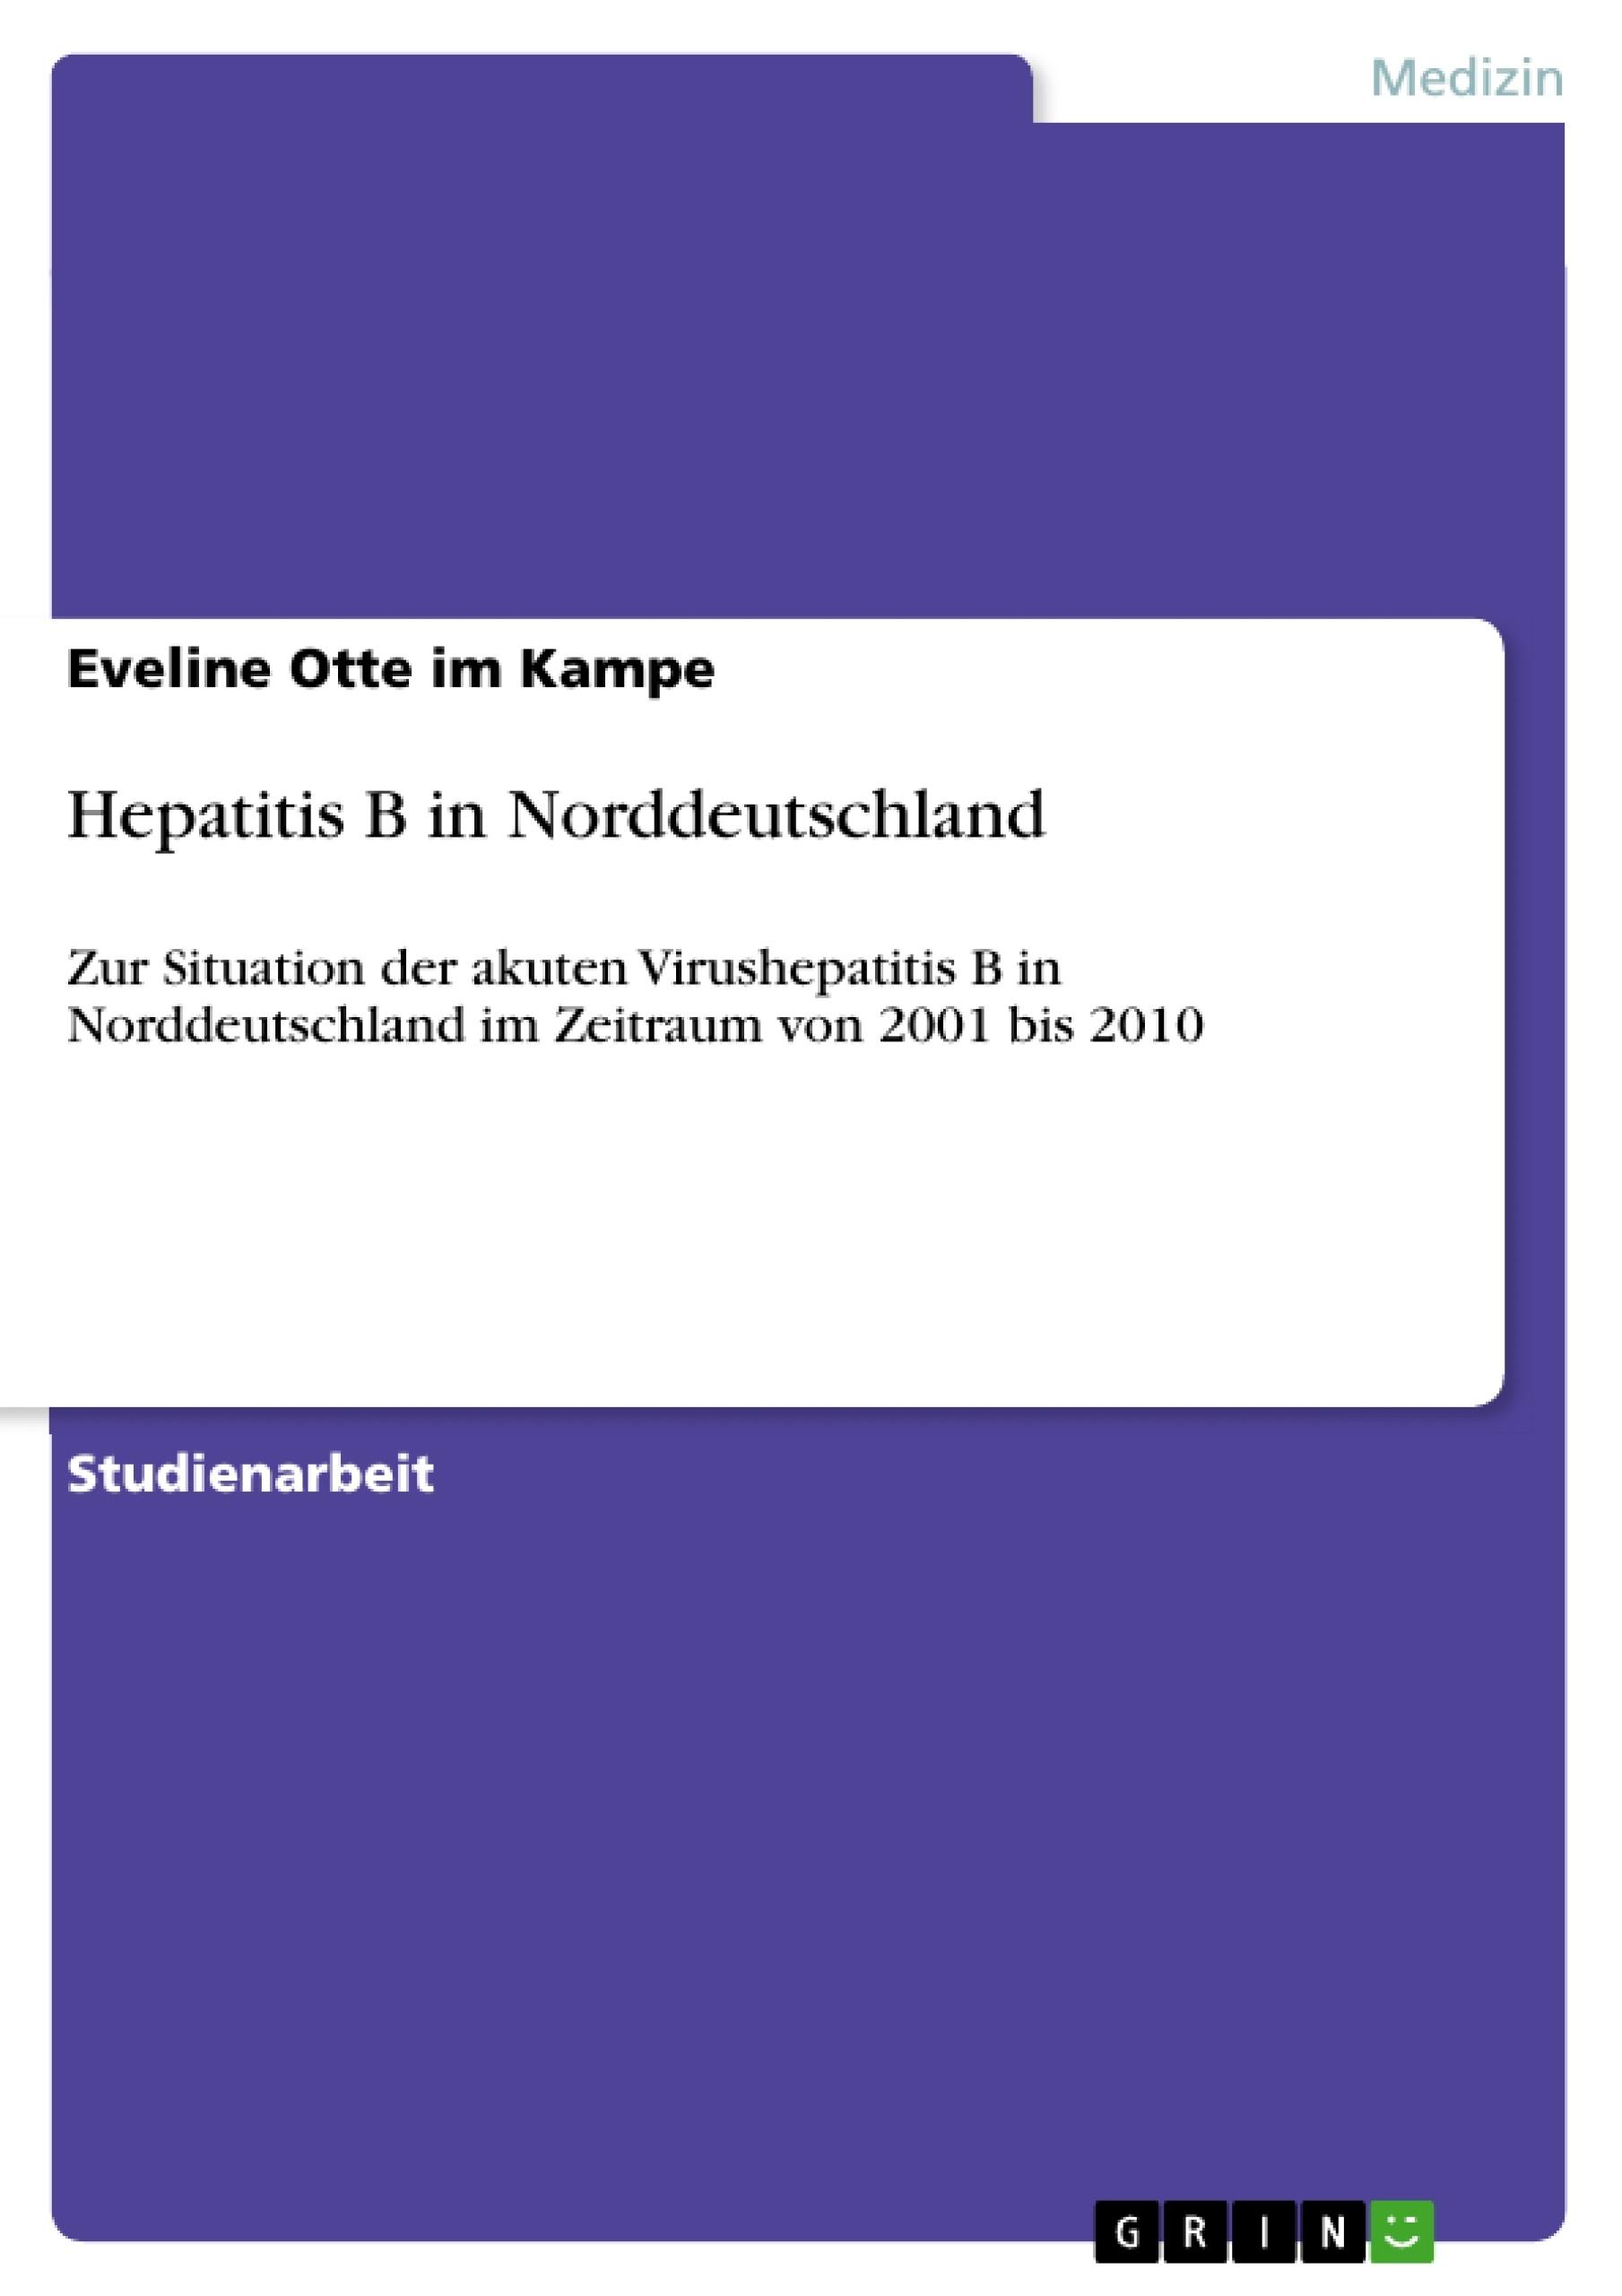 Titel: Hepatitis B in Norddeutschland